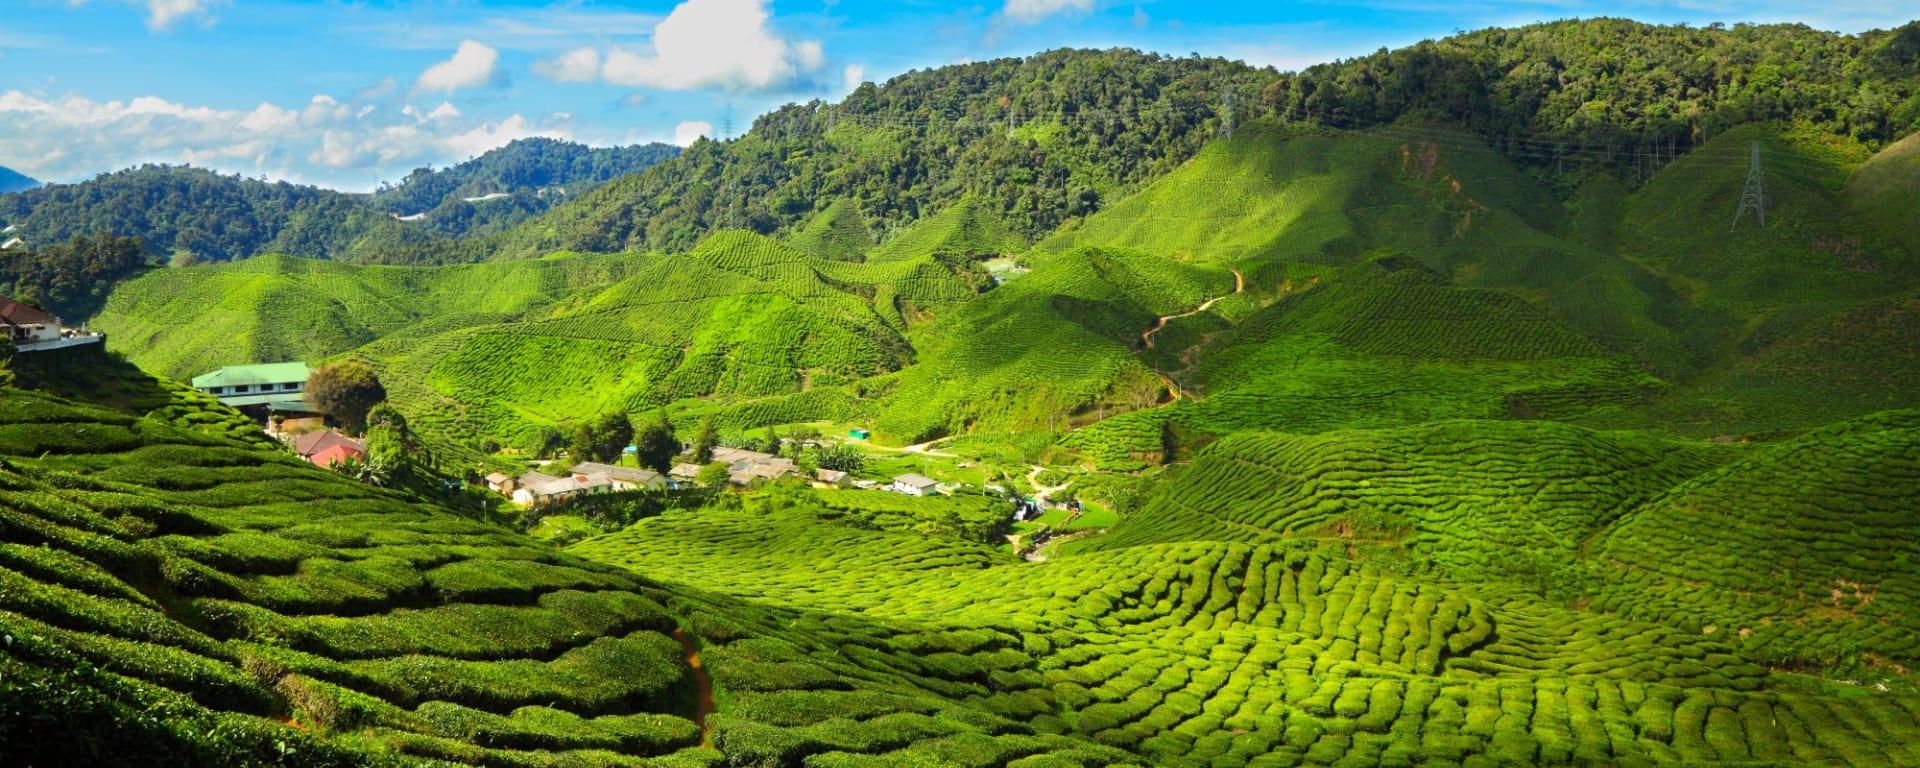 Höhepunkte Malaysias ab Kuala Lumpur: Malaysia Cameron Highlands Tea Plantations